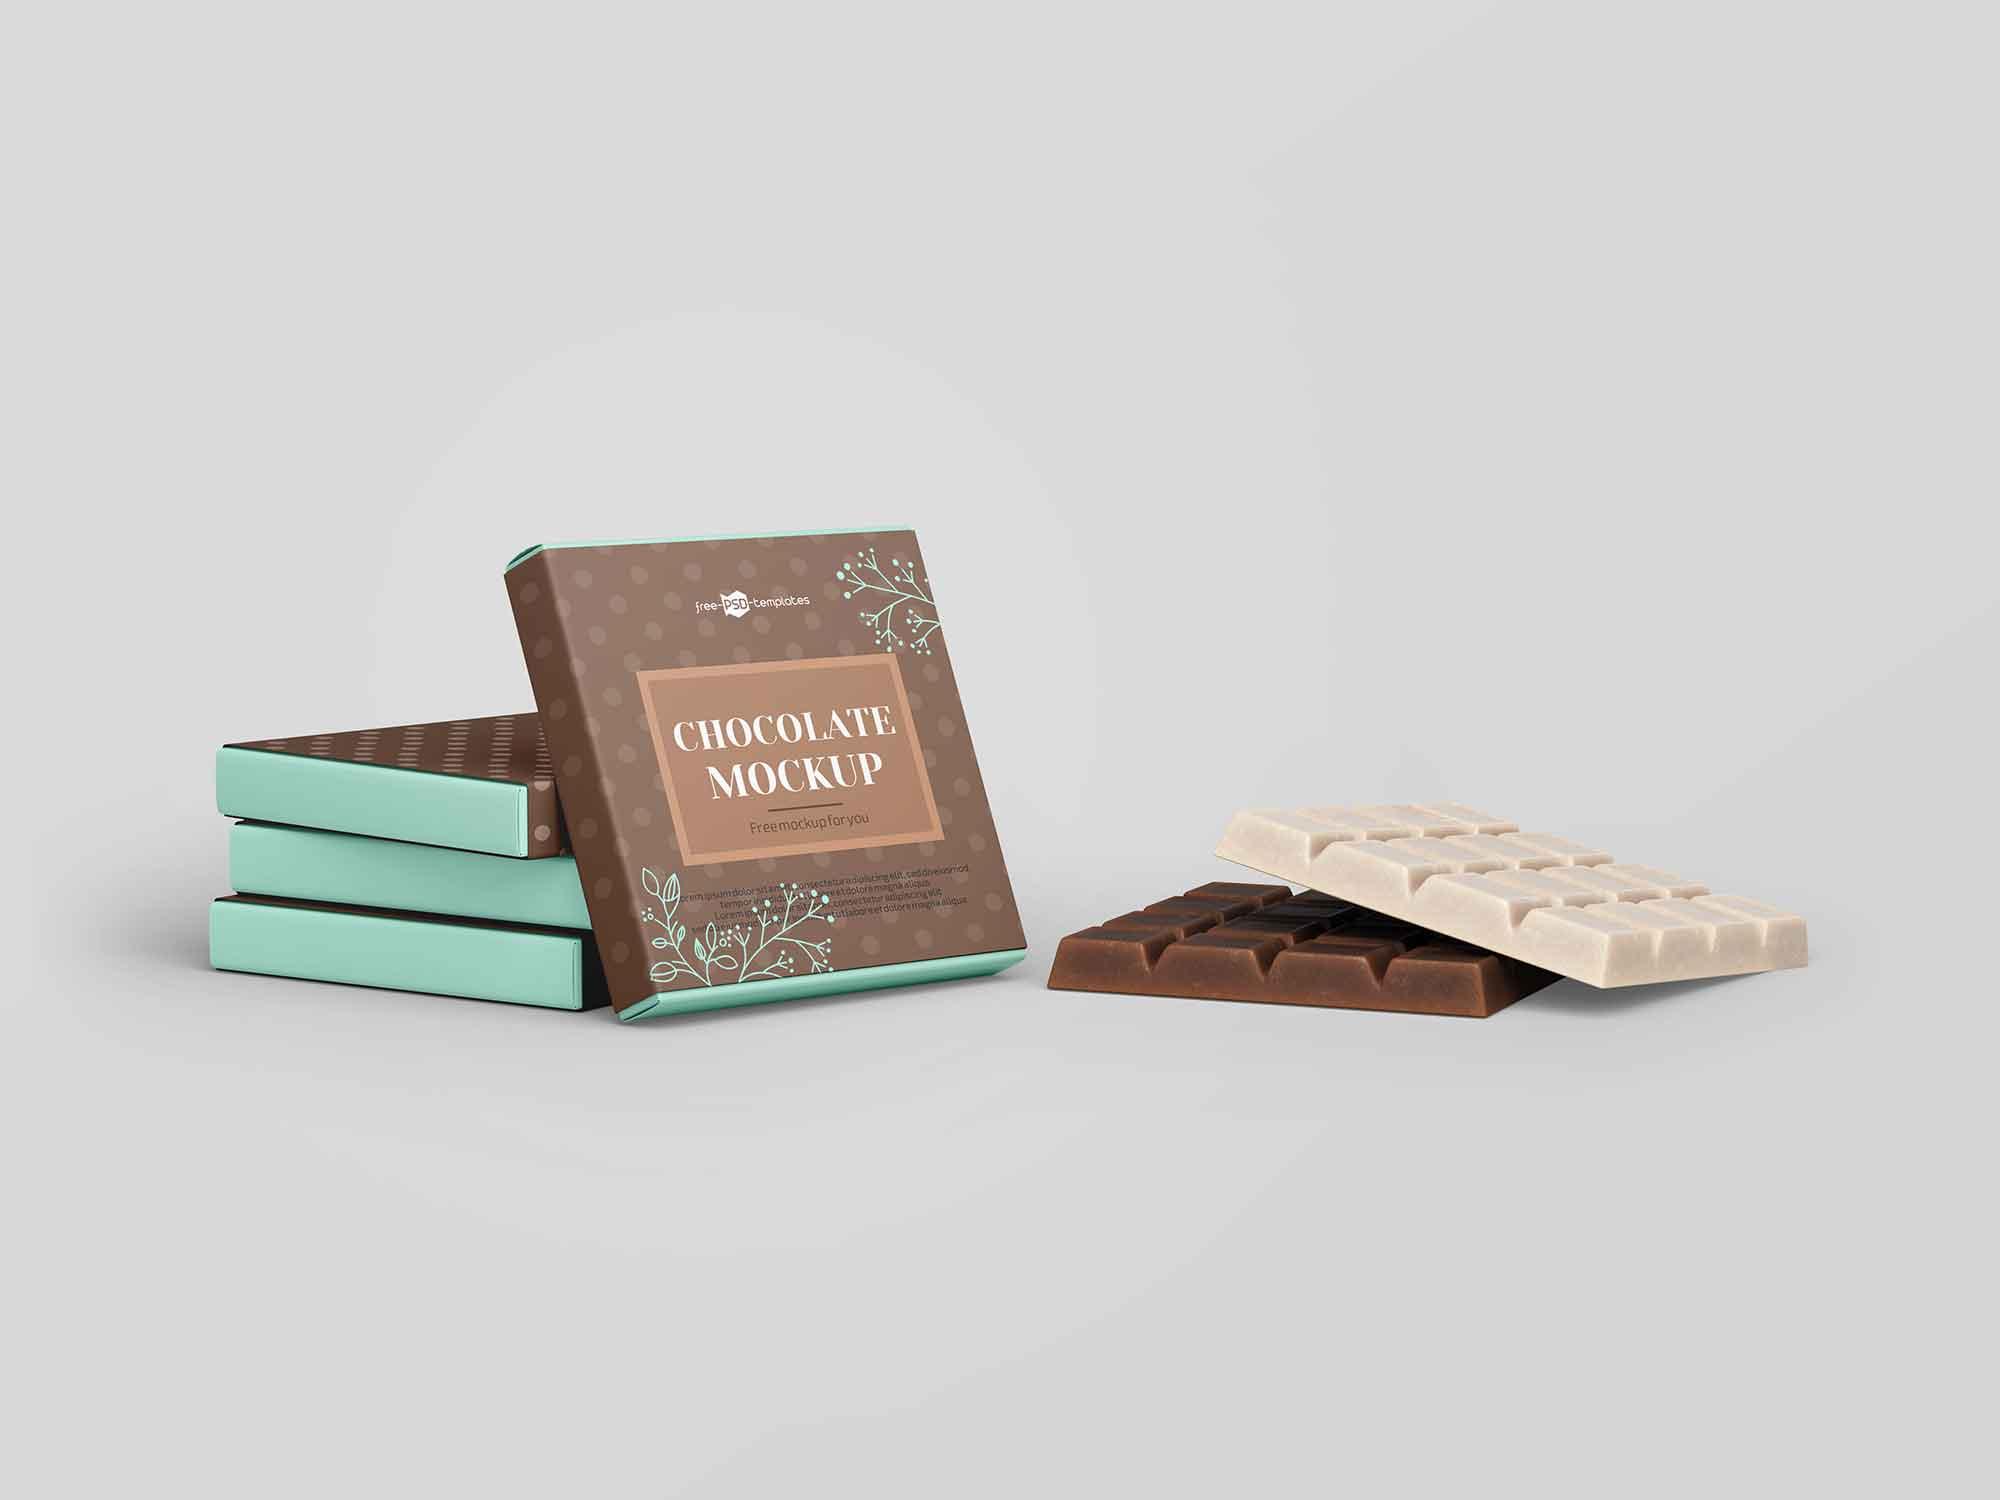 Free Square Bar Of Chocolate Mockup Psd